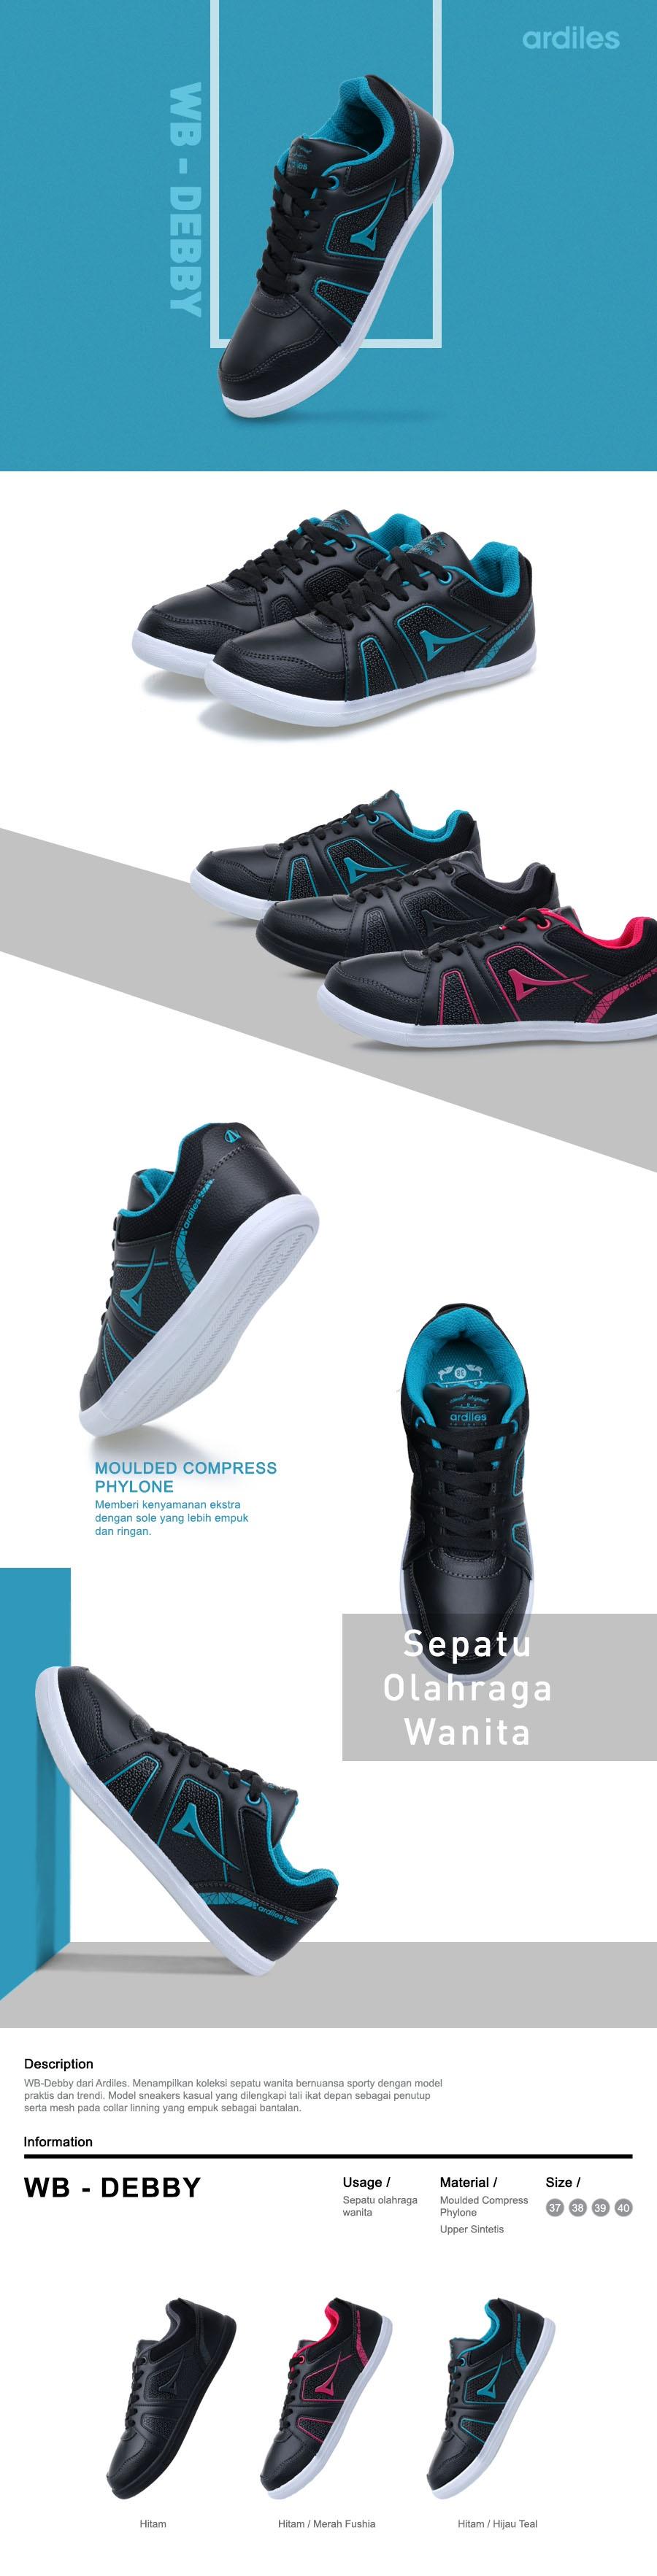 Every Need Want Day Catenzo Sepatu Futsal Sintetis Original Men Shoes Hitam  Merah Spec Img 5ff5c582e6